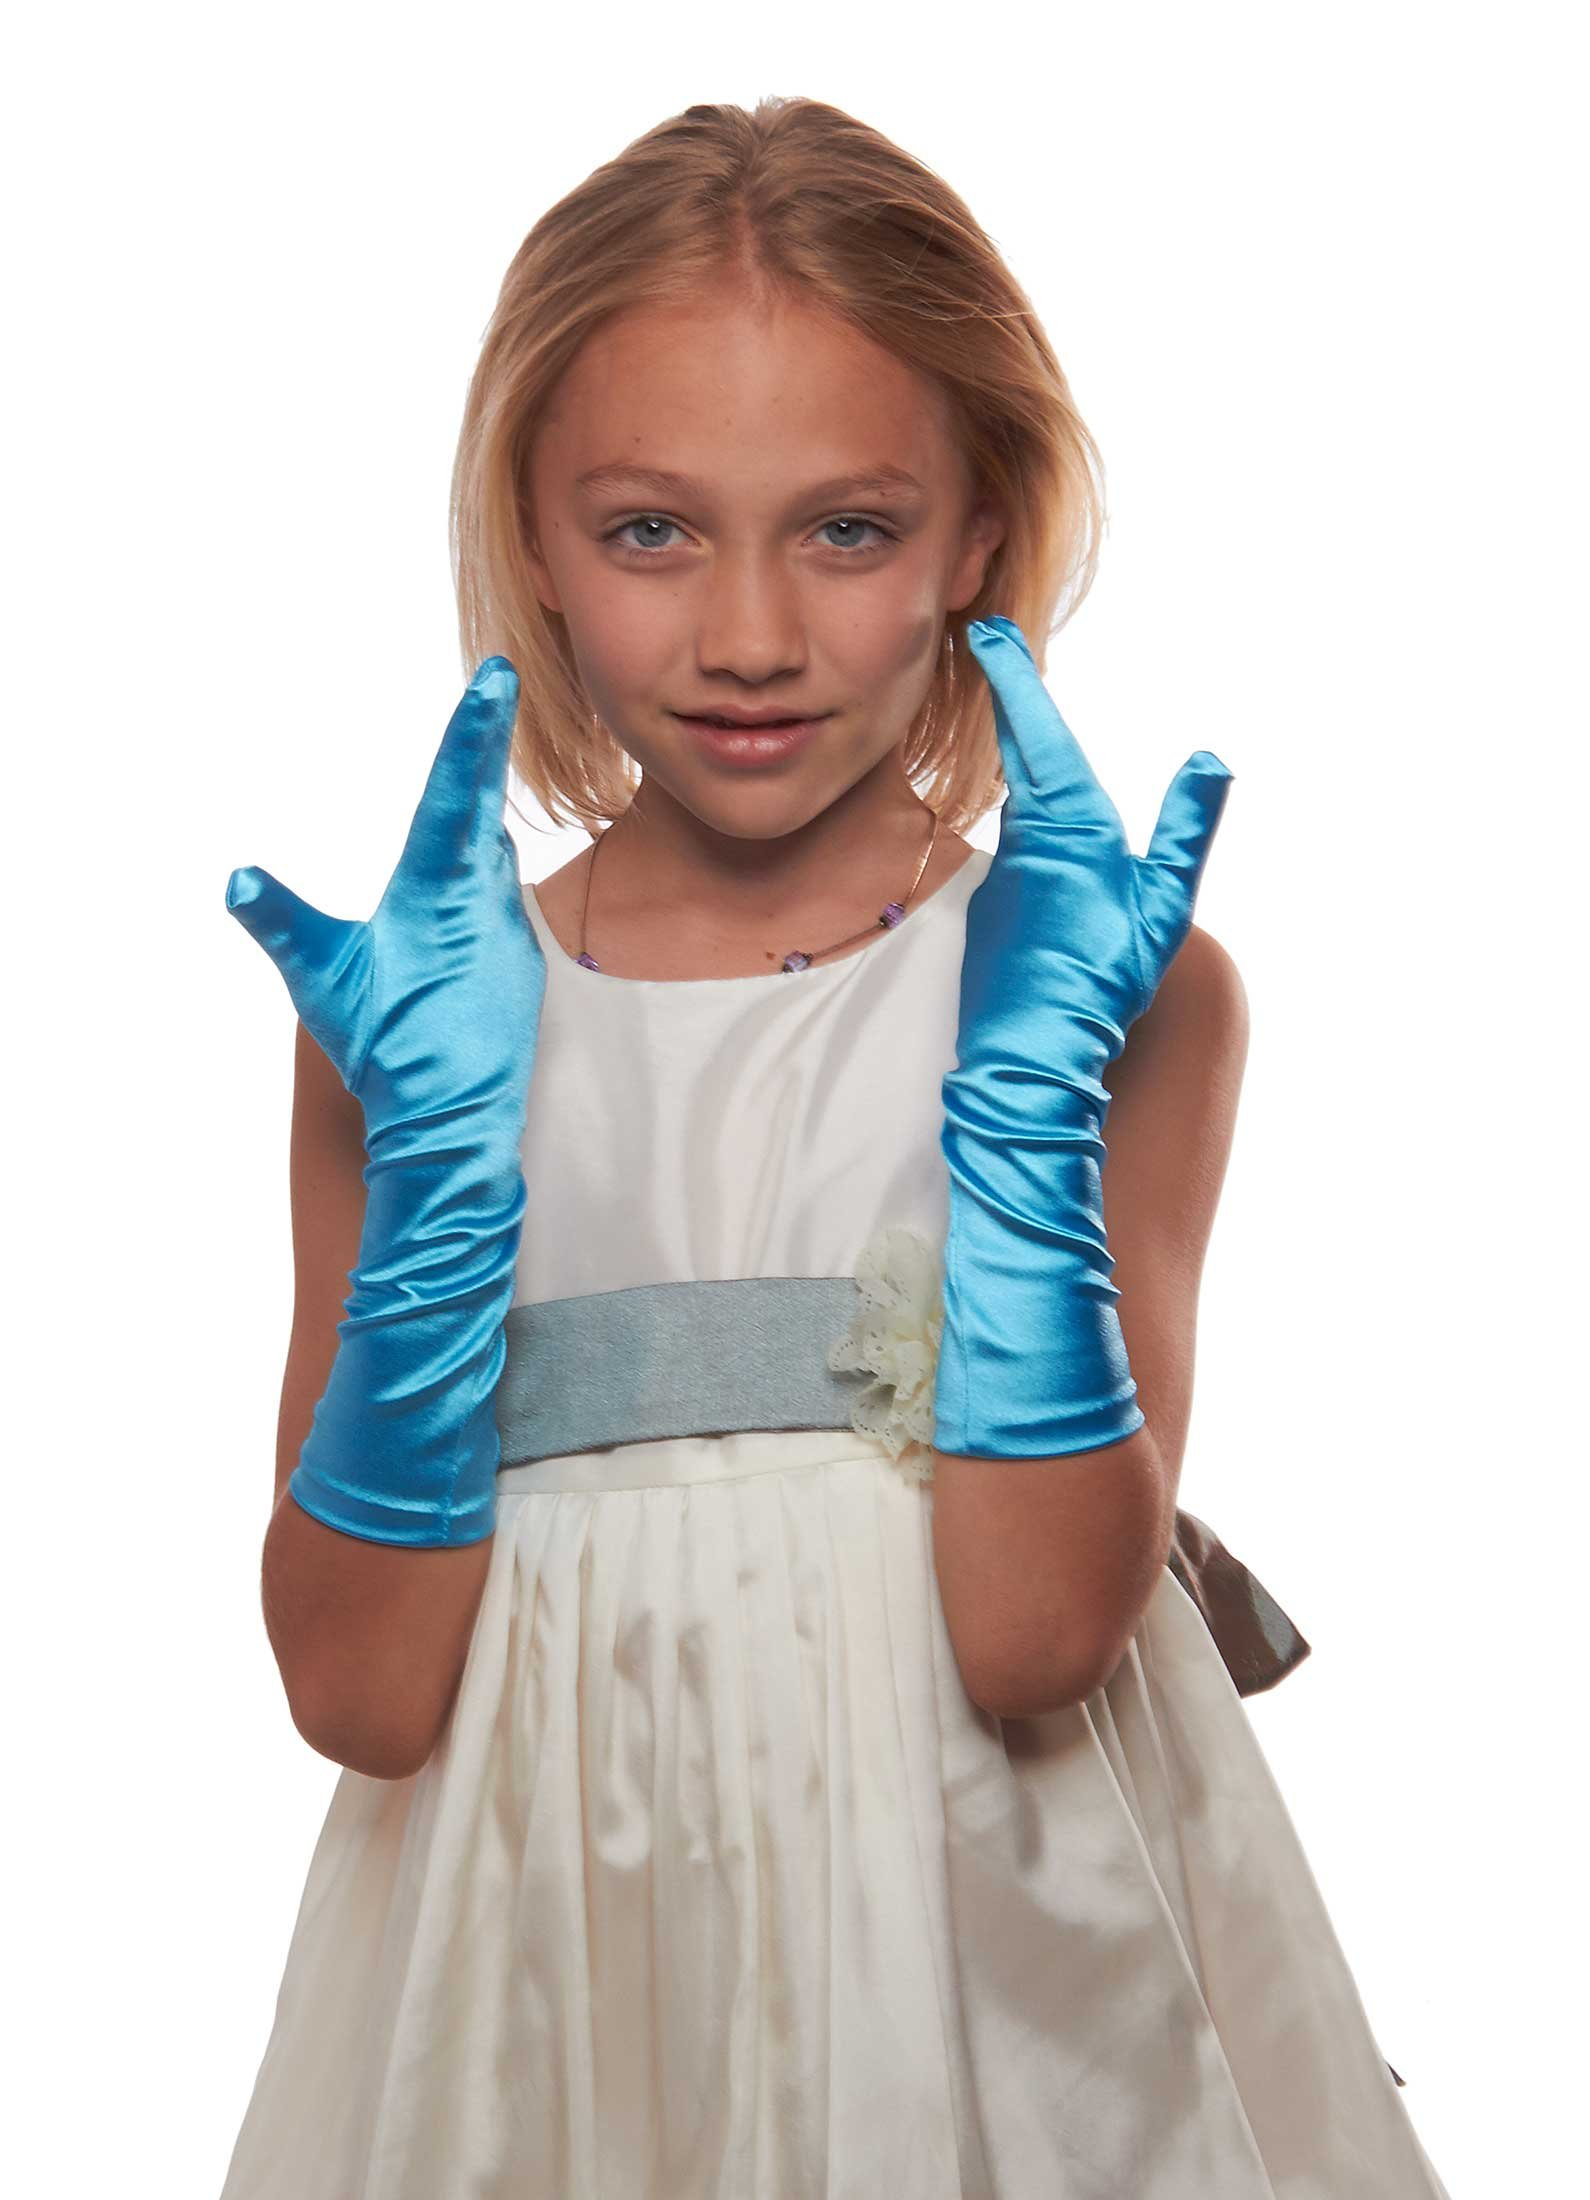 Showstopper Shiny Satin Elbow Length Gloves for Girls (Sky Blue, 8-12)